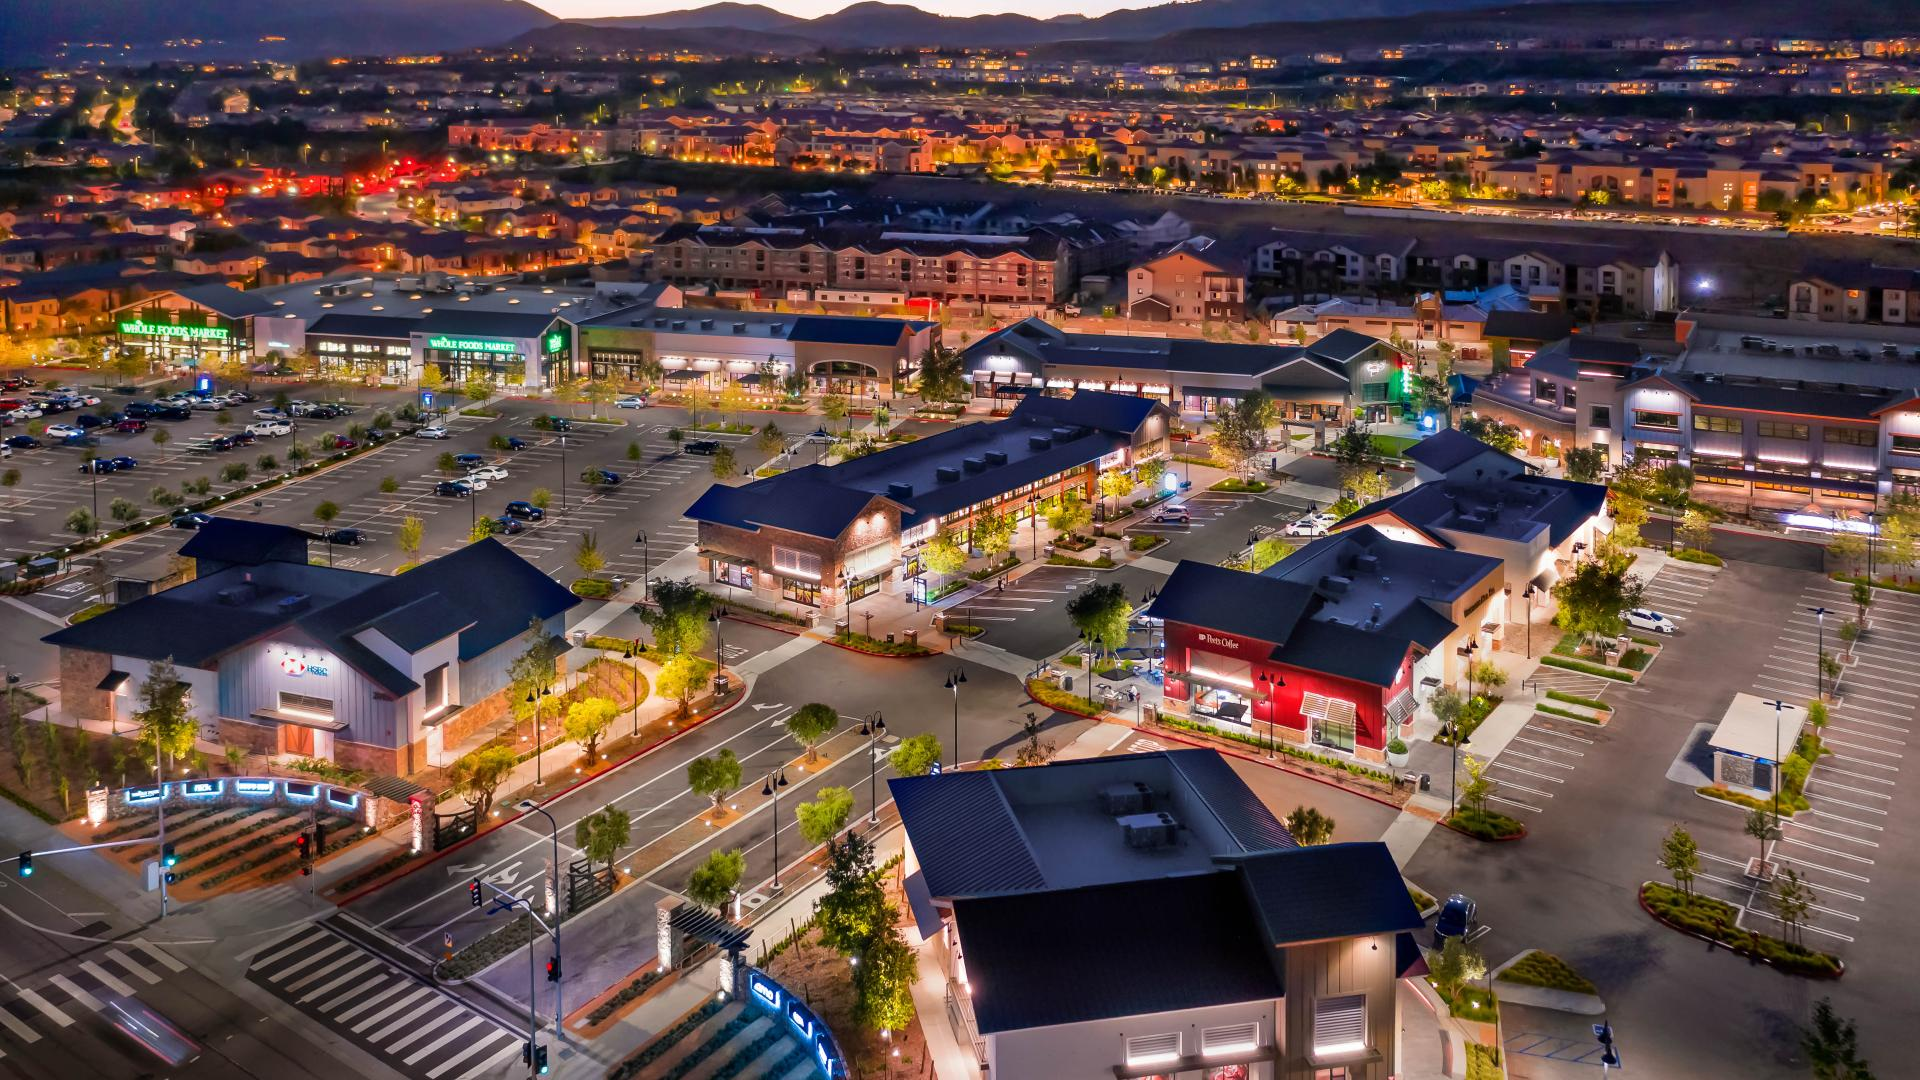 Brand new Porter Ranch shopping center